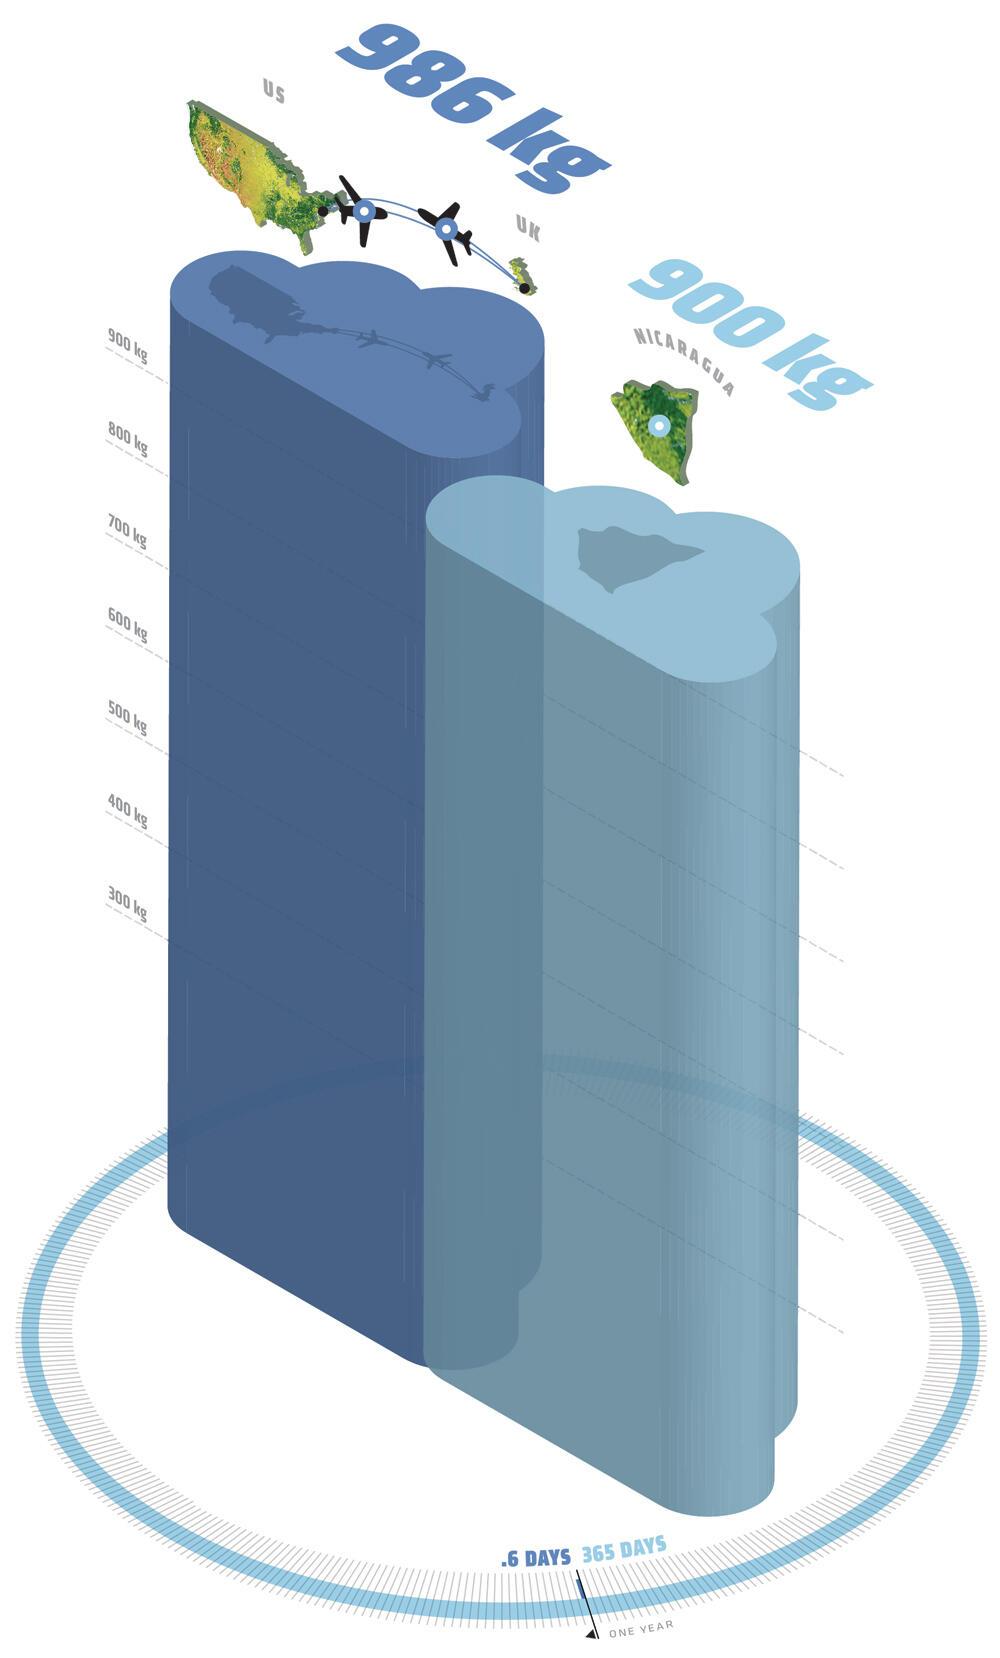 Bar chart depicting carbon emissions